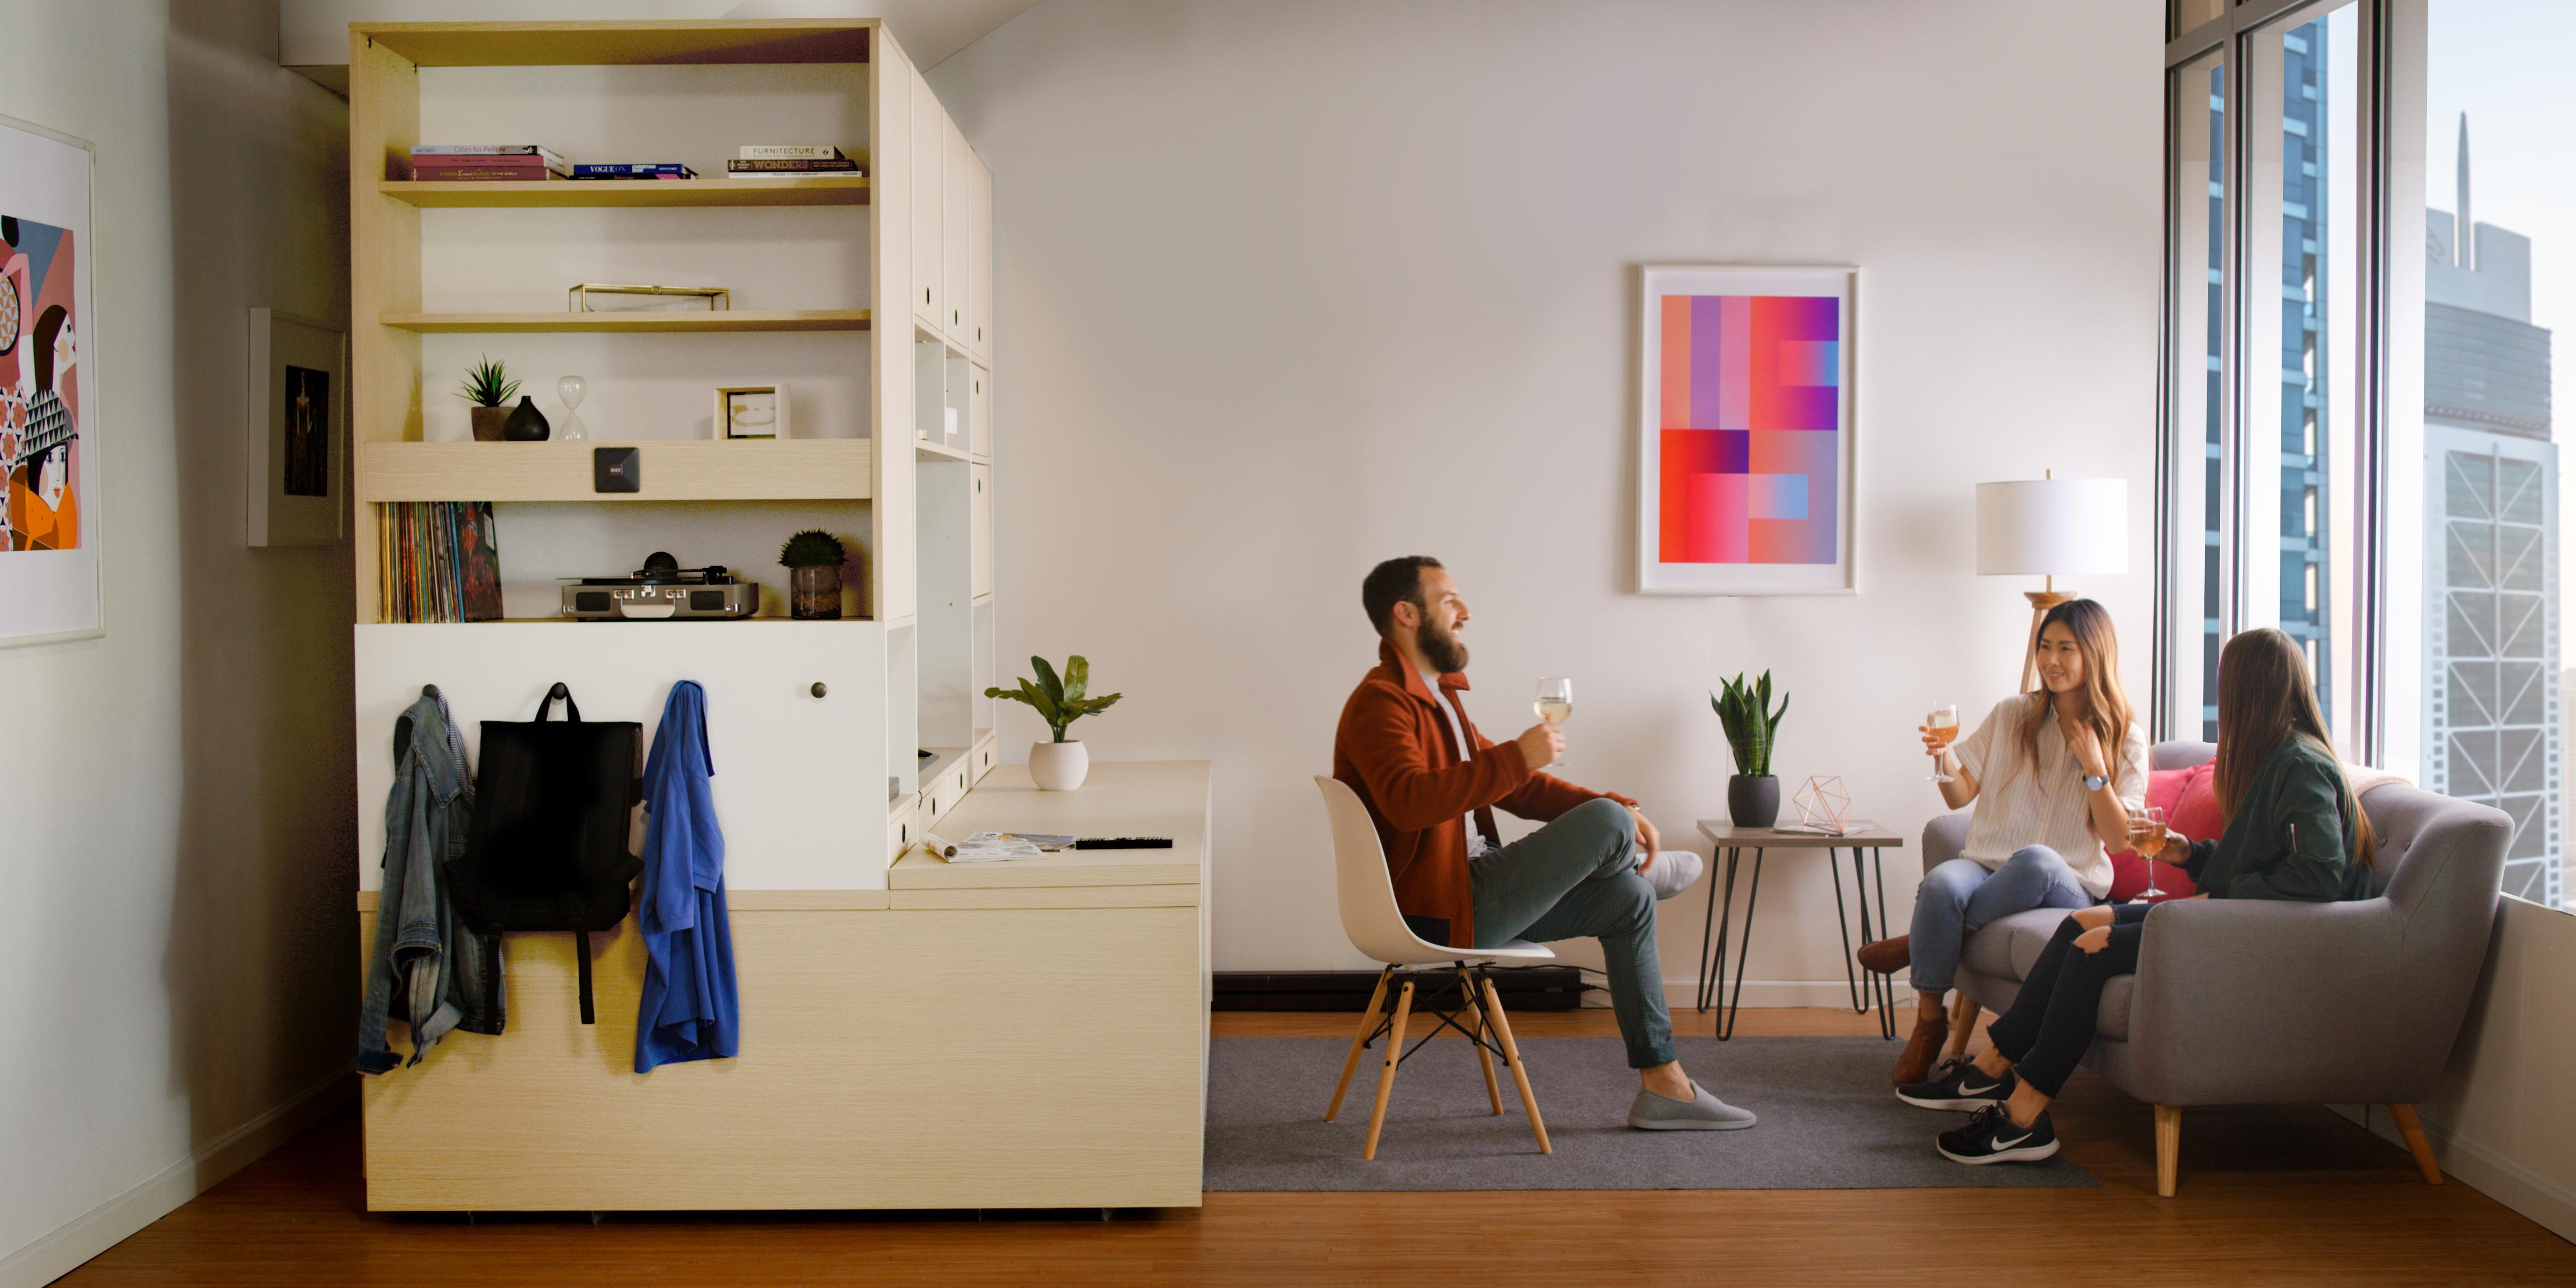 all-in-one furniture unit